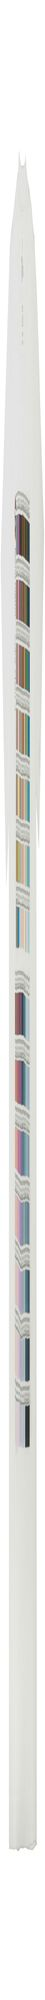 Футболка T-bolka 160 c DTG-печатью Kornit Color chart 3, белая